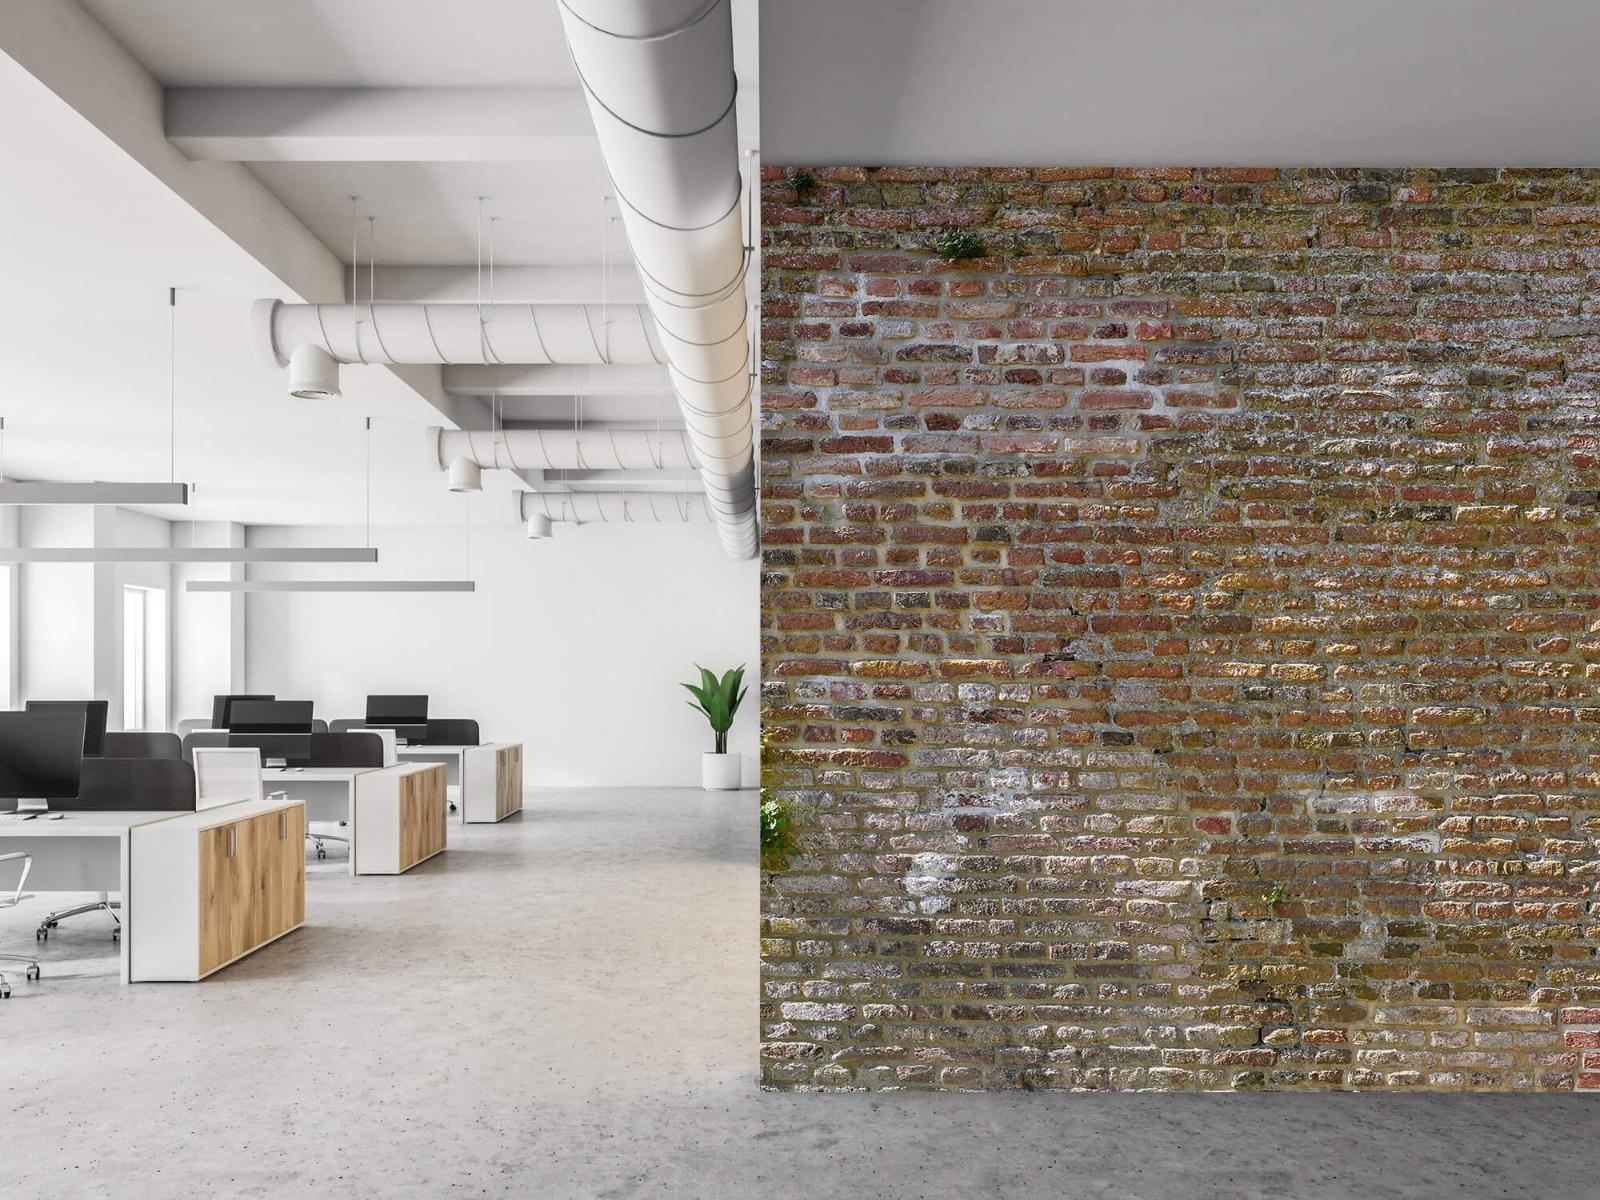 Stenen - Oude stenen stadsmuur met plantjes 21